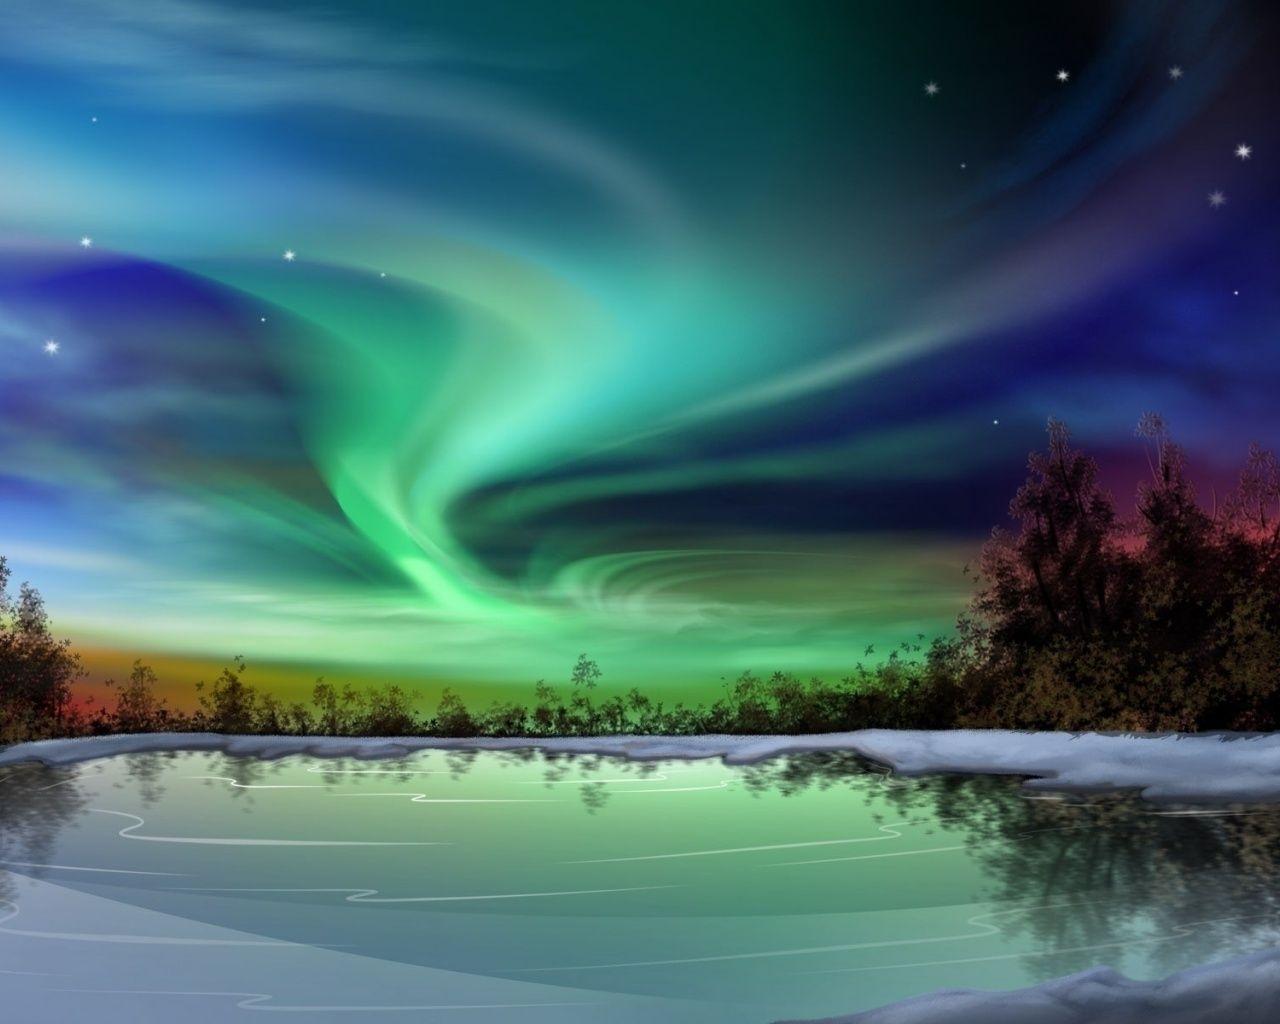 1280x1024 aurora borealis night winter | northern lights | pinterest